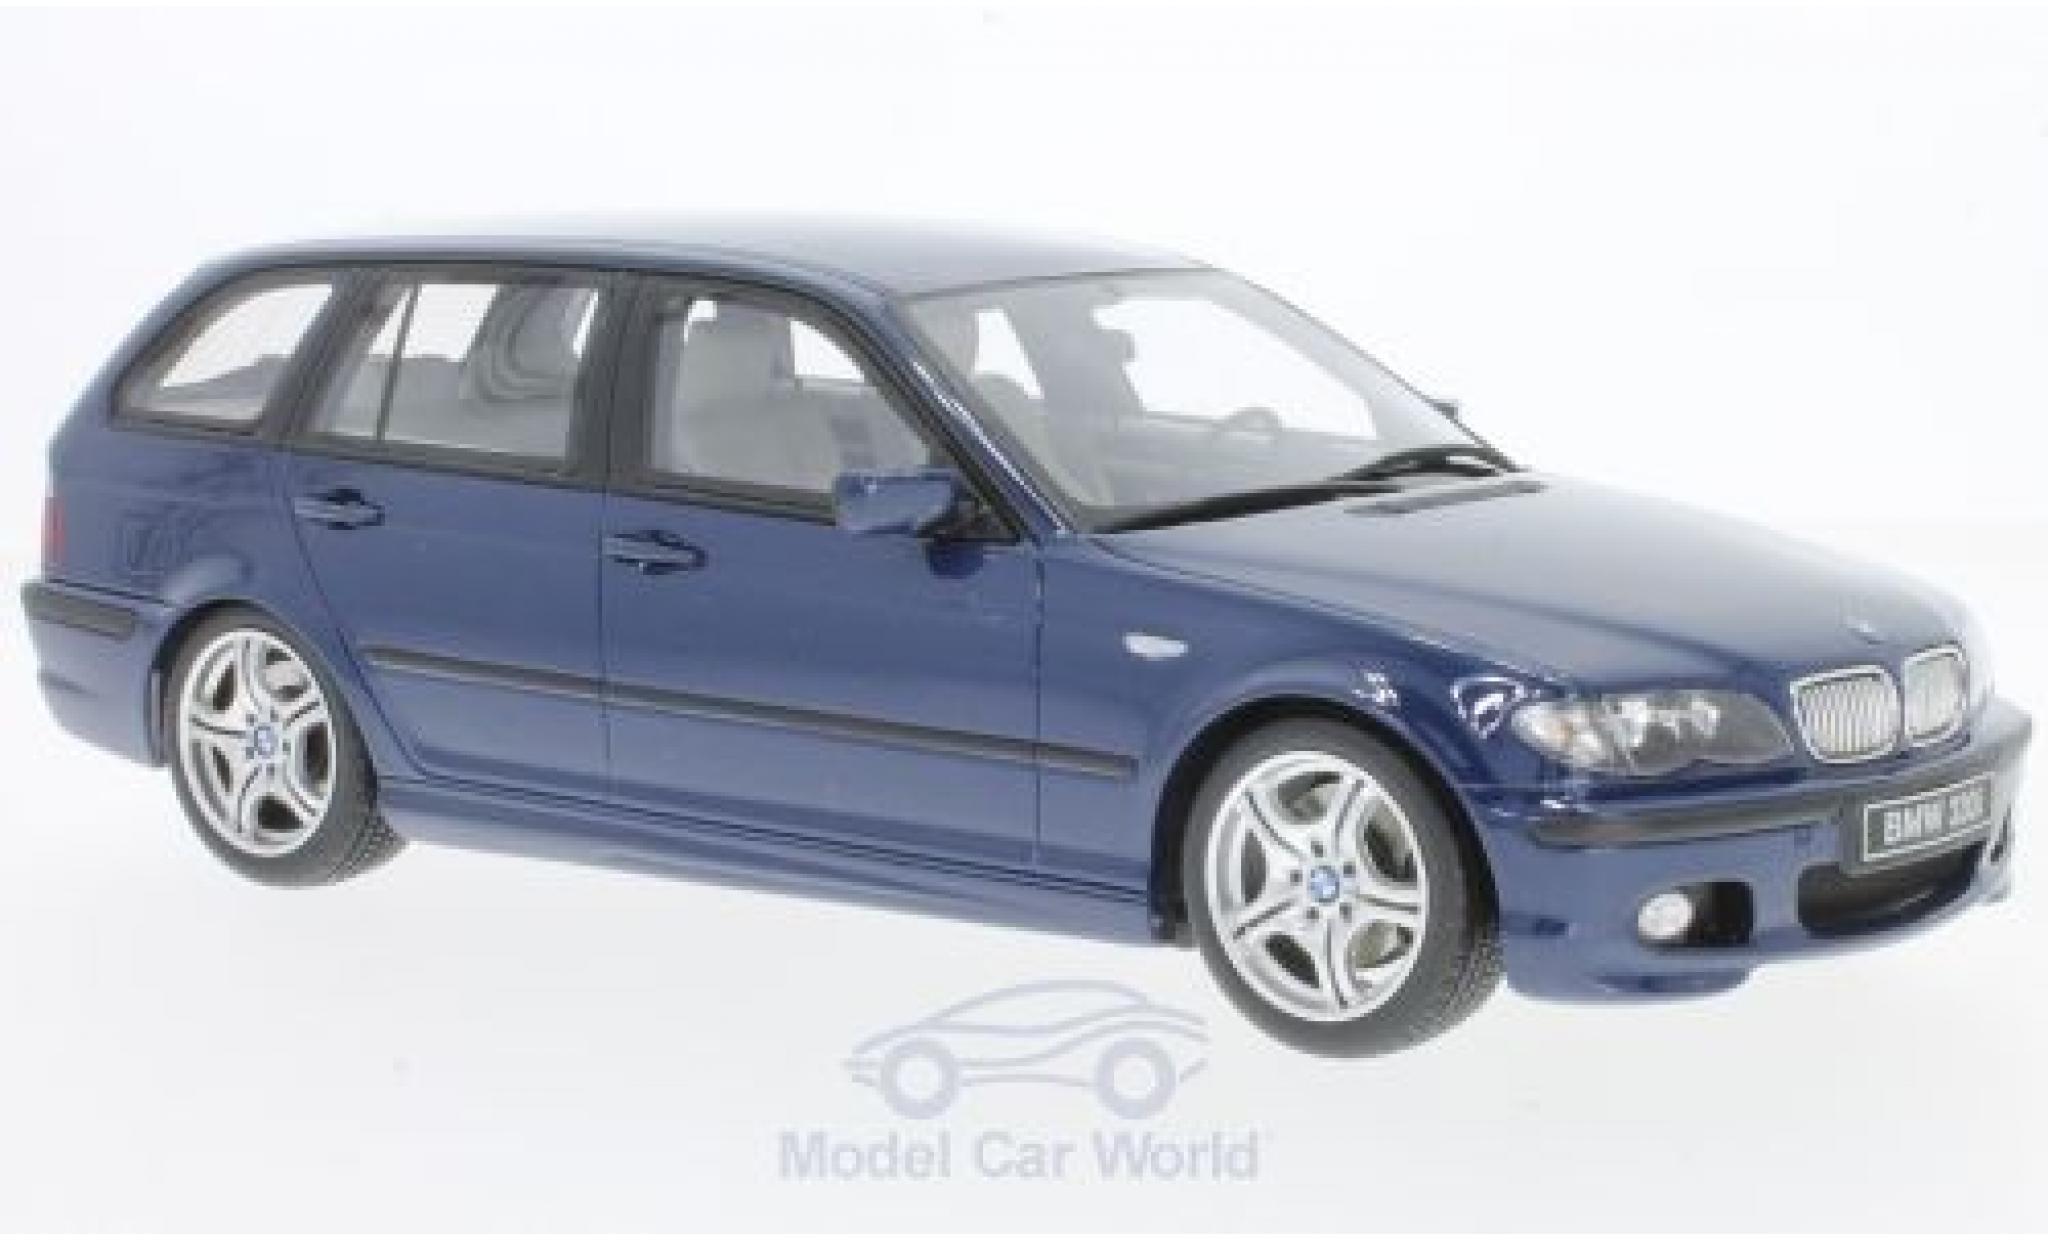 Bmw 330 E46 1/18 Ottomobile BMW i (E46) Touring M Pack metallic-blue 2005